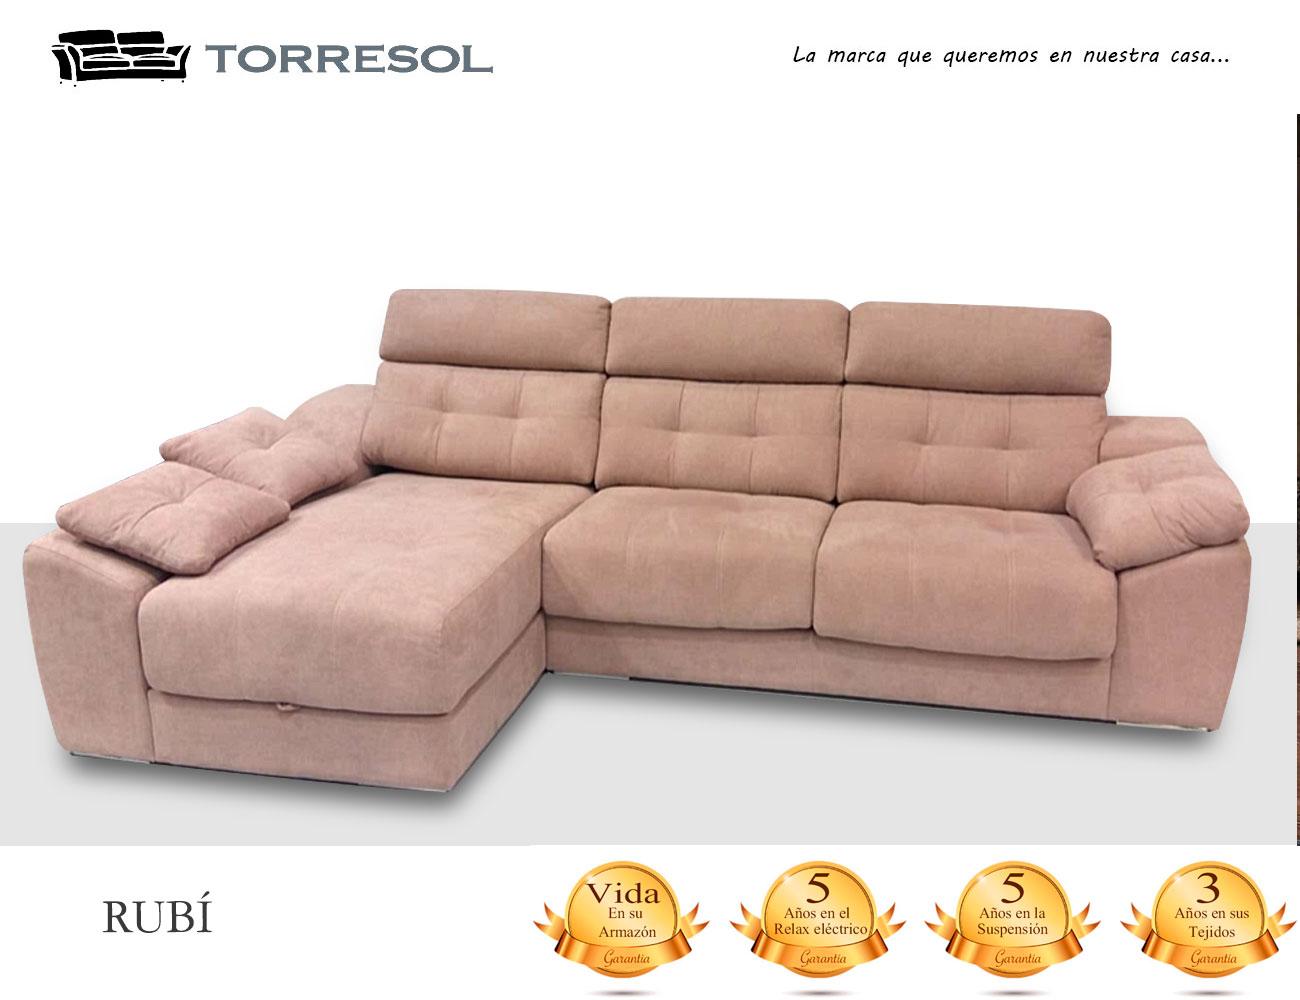 Sofa rubi torresol